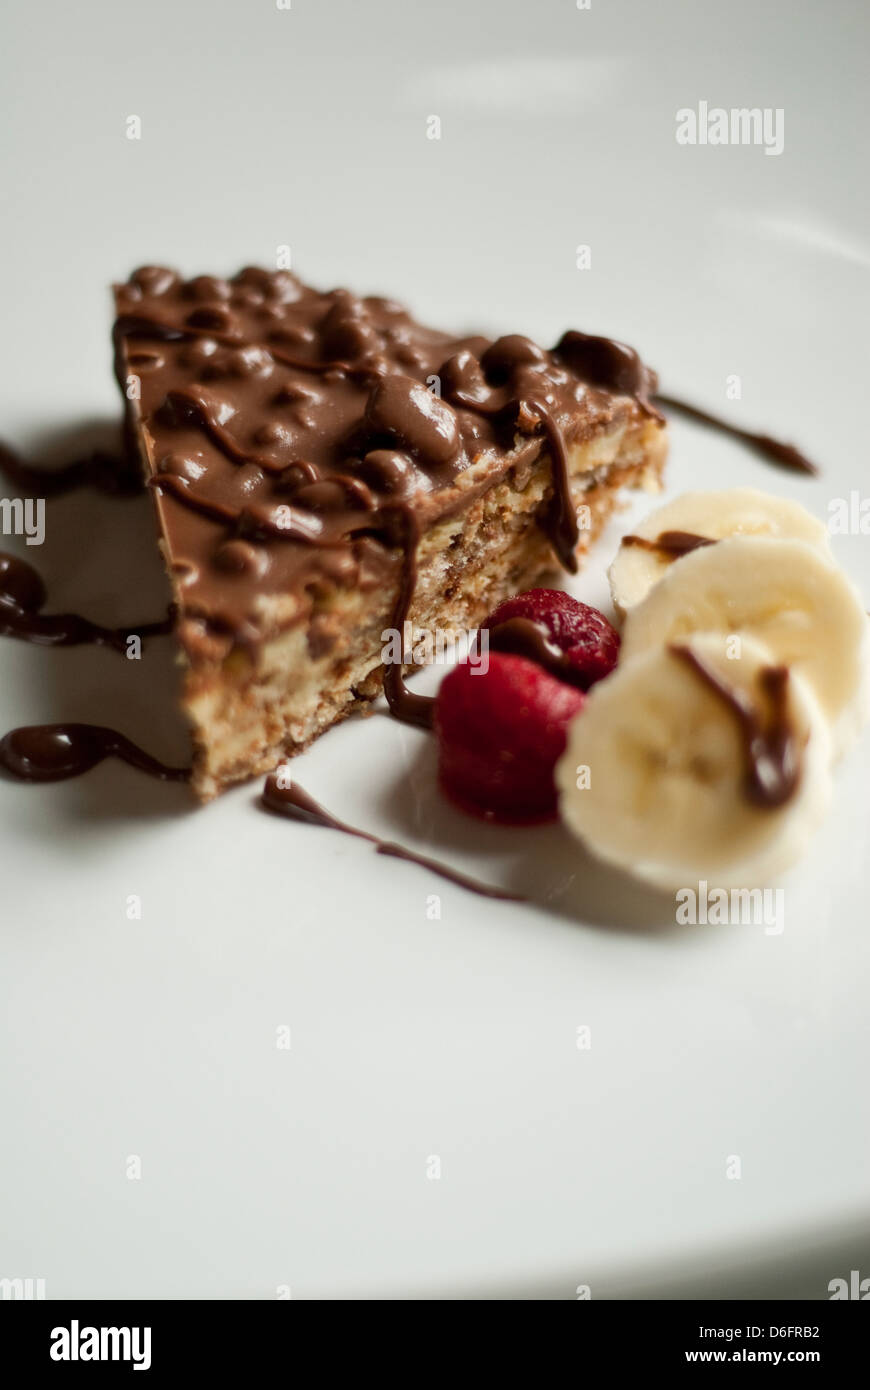 Daim Schokolade Kuchen Stockfoto Bild 55666662 Alamy